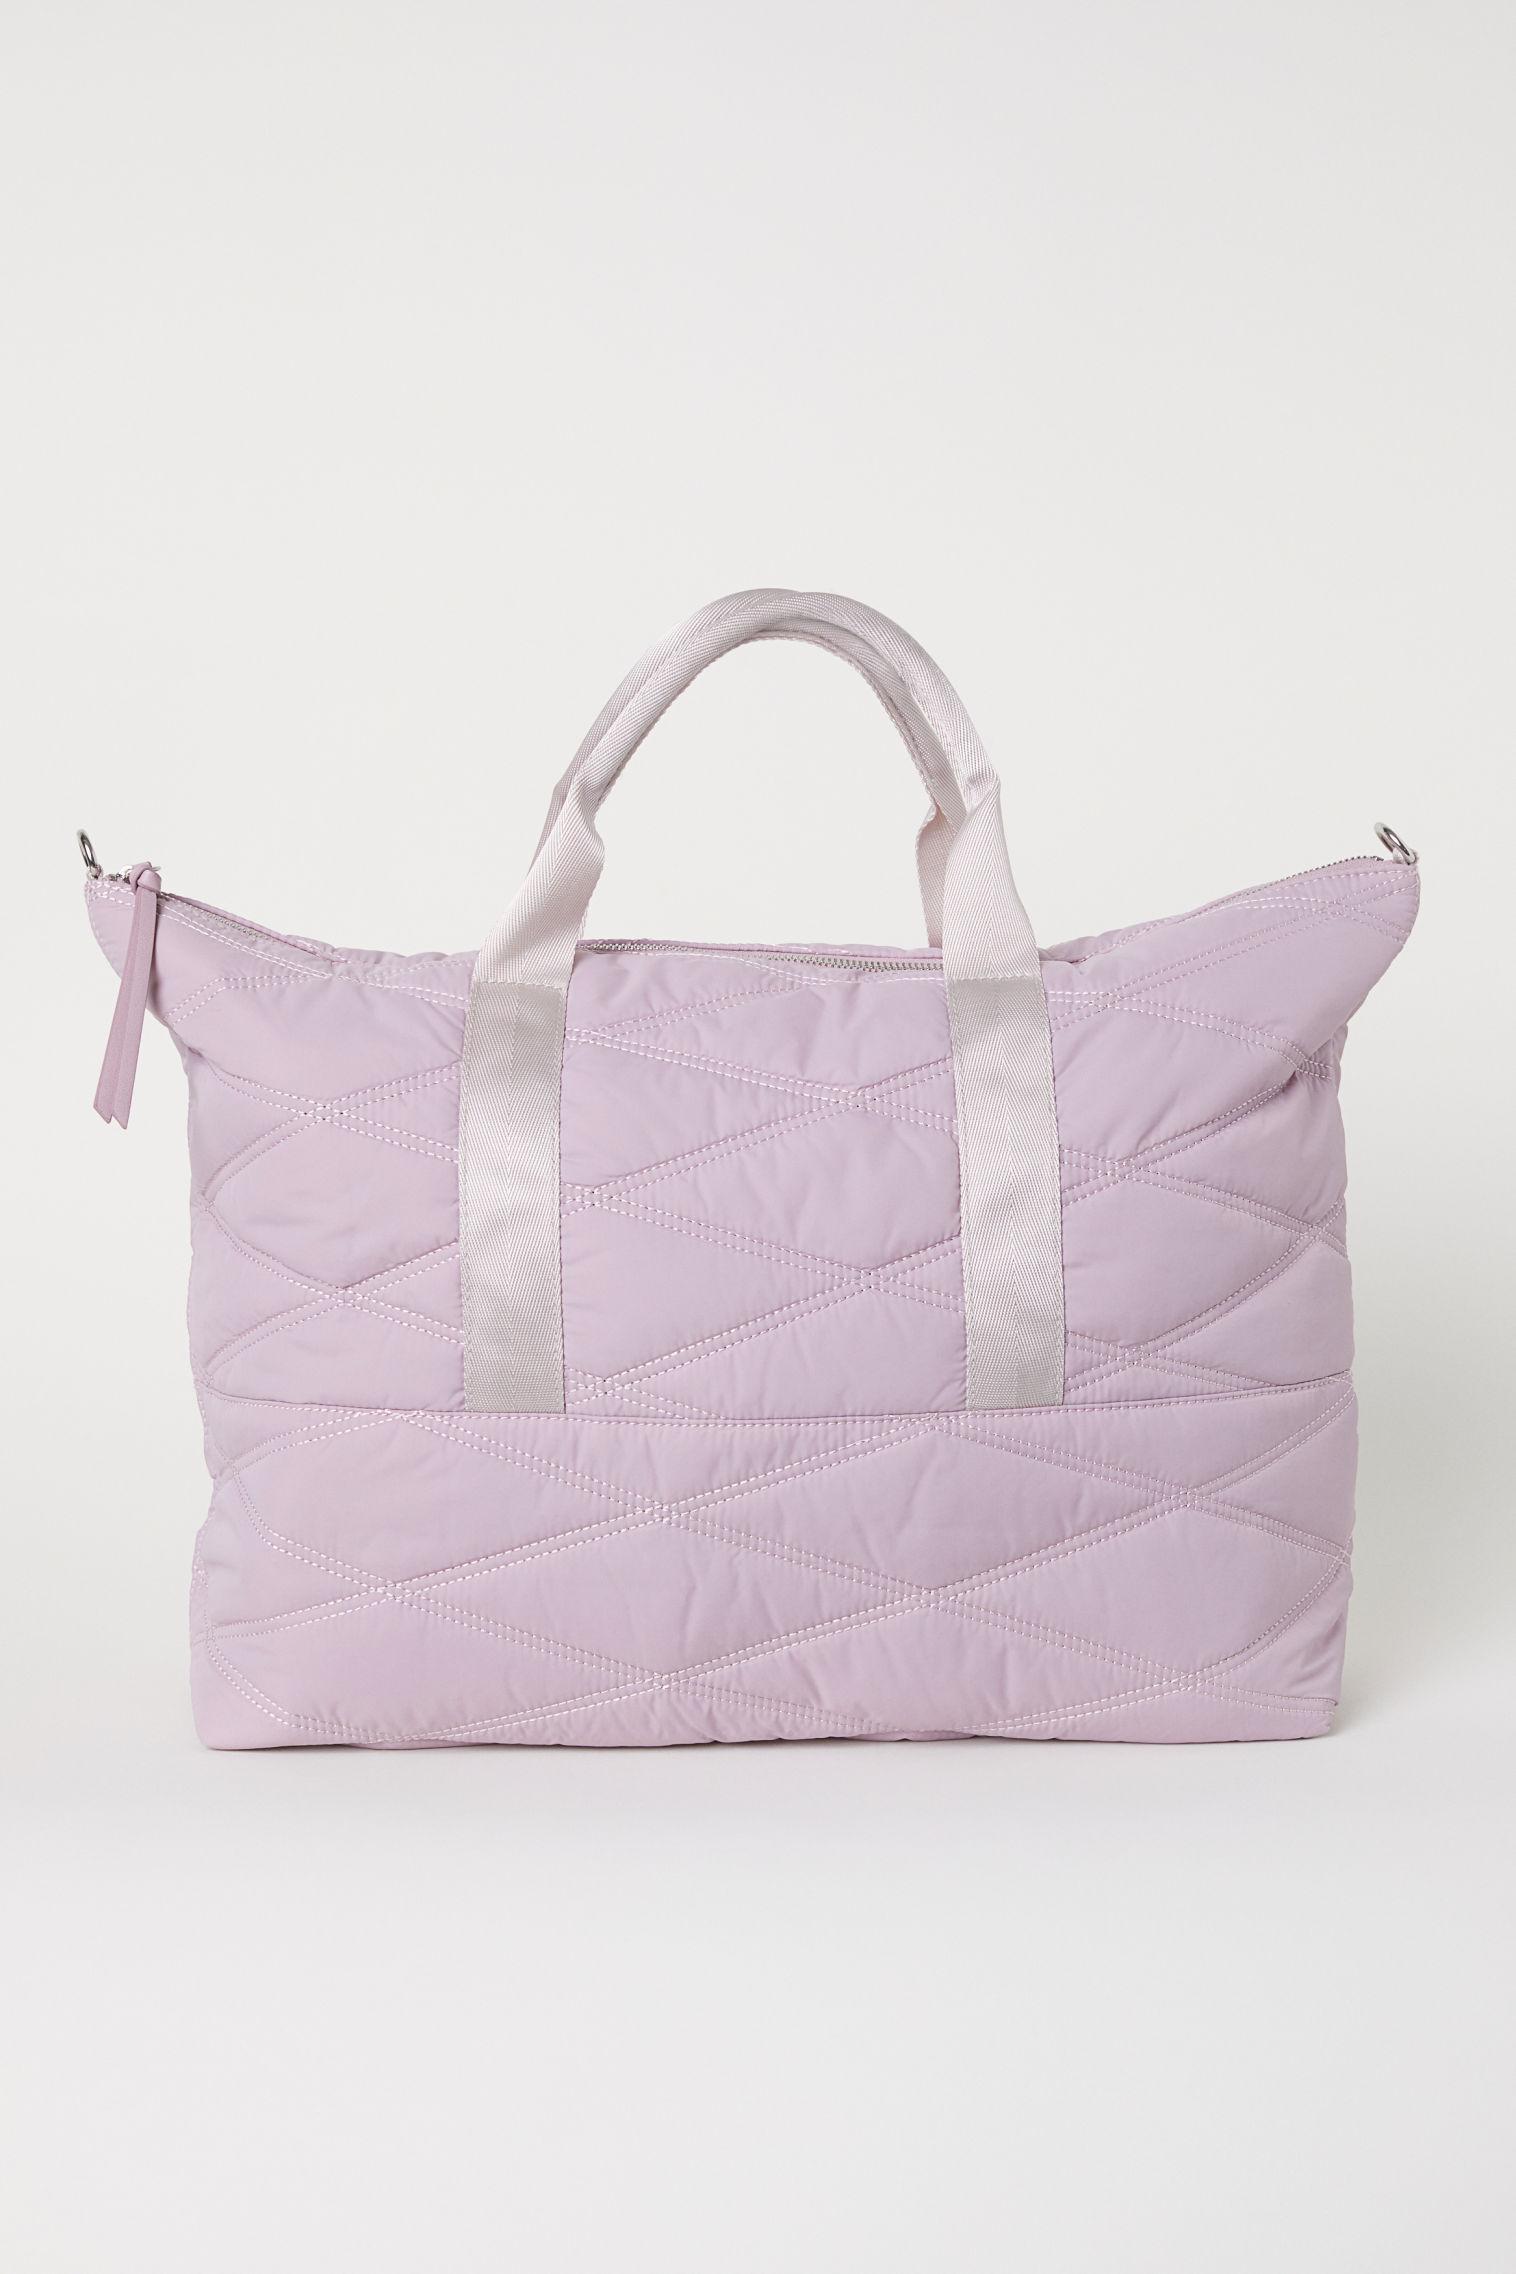 7e9dc186e20cb H M Gesteppte Weekendbag in Pink - Lyst